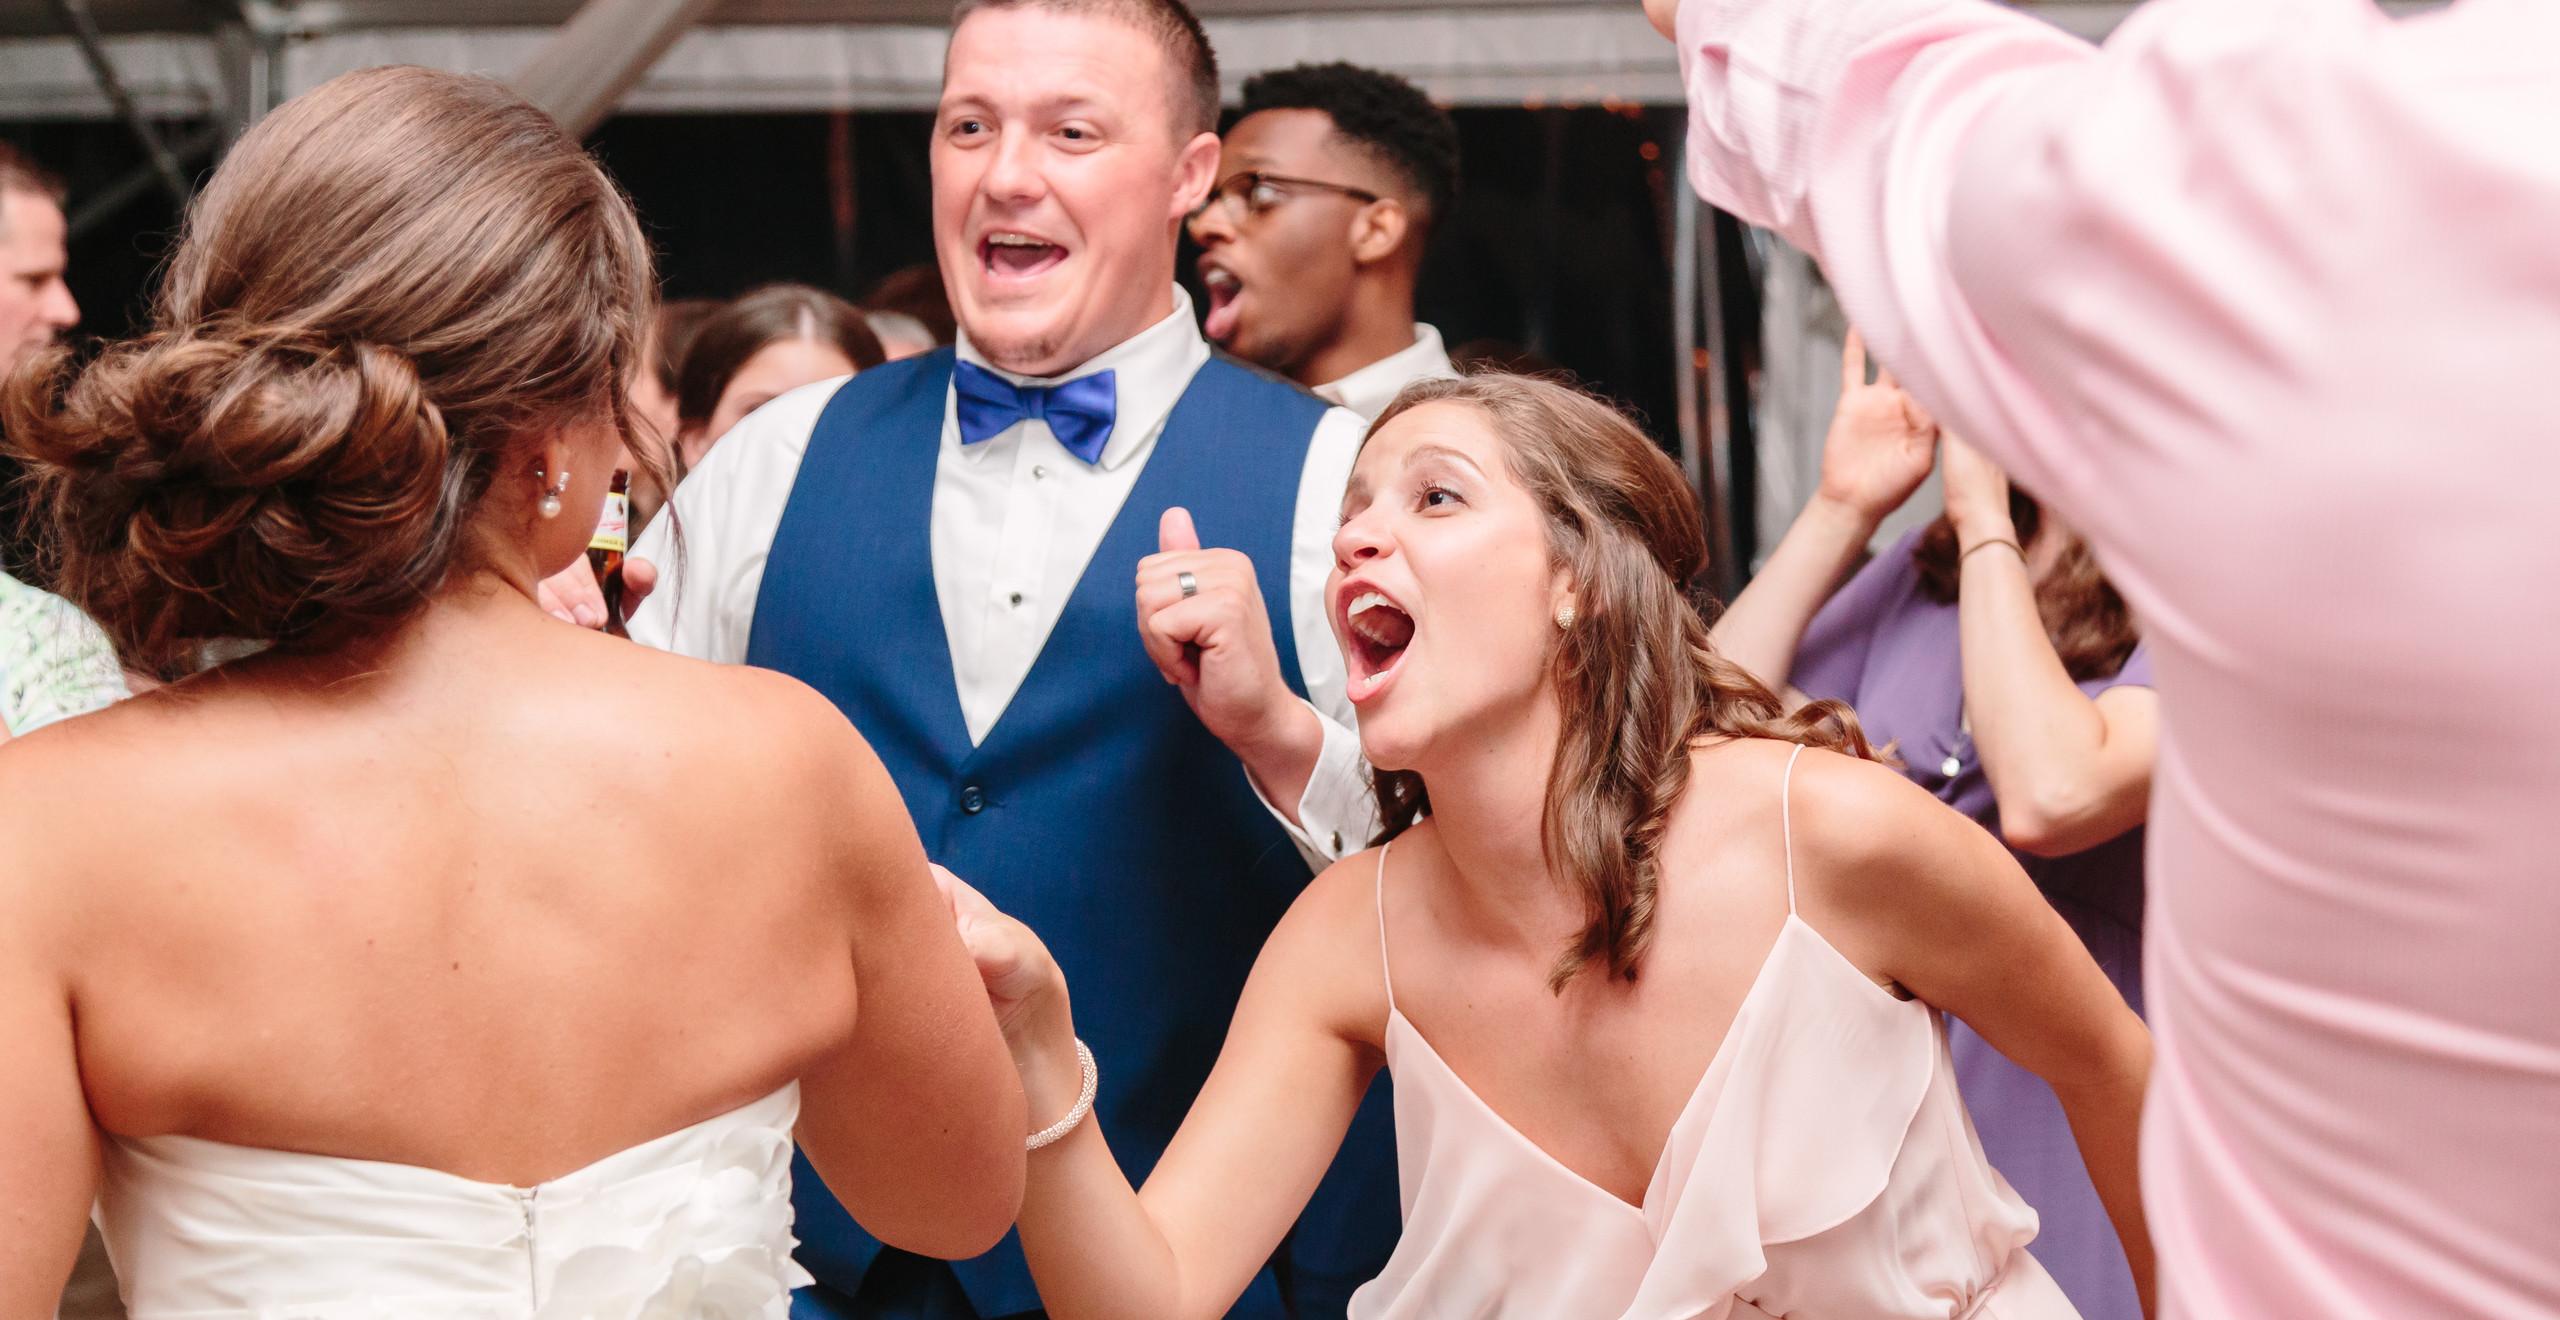 groom, bride and bridesmaid singing